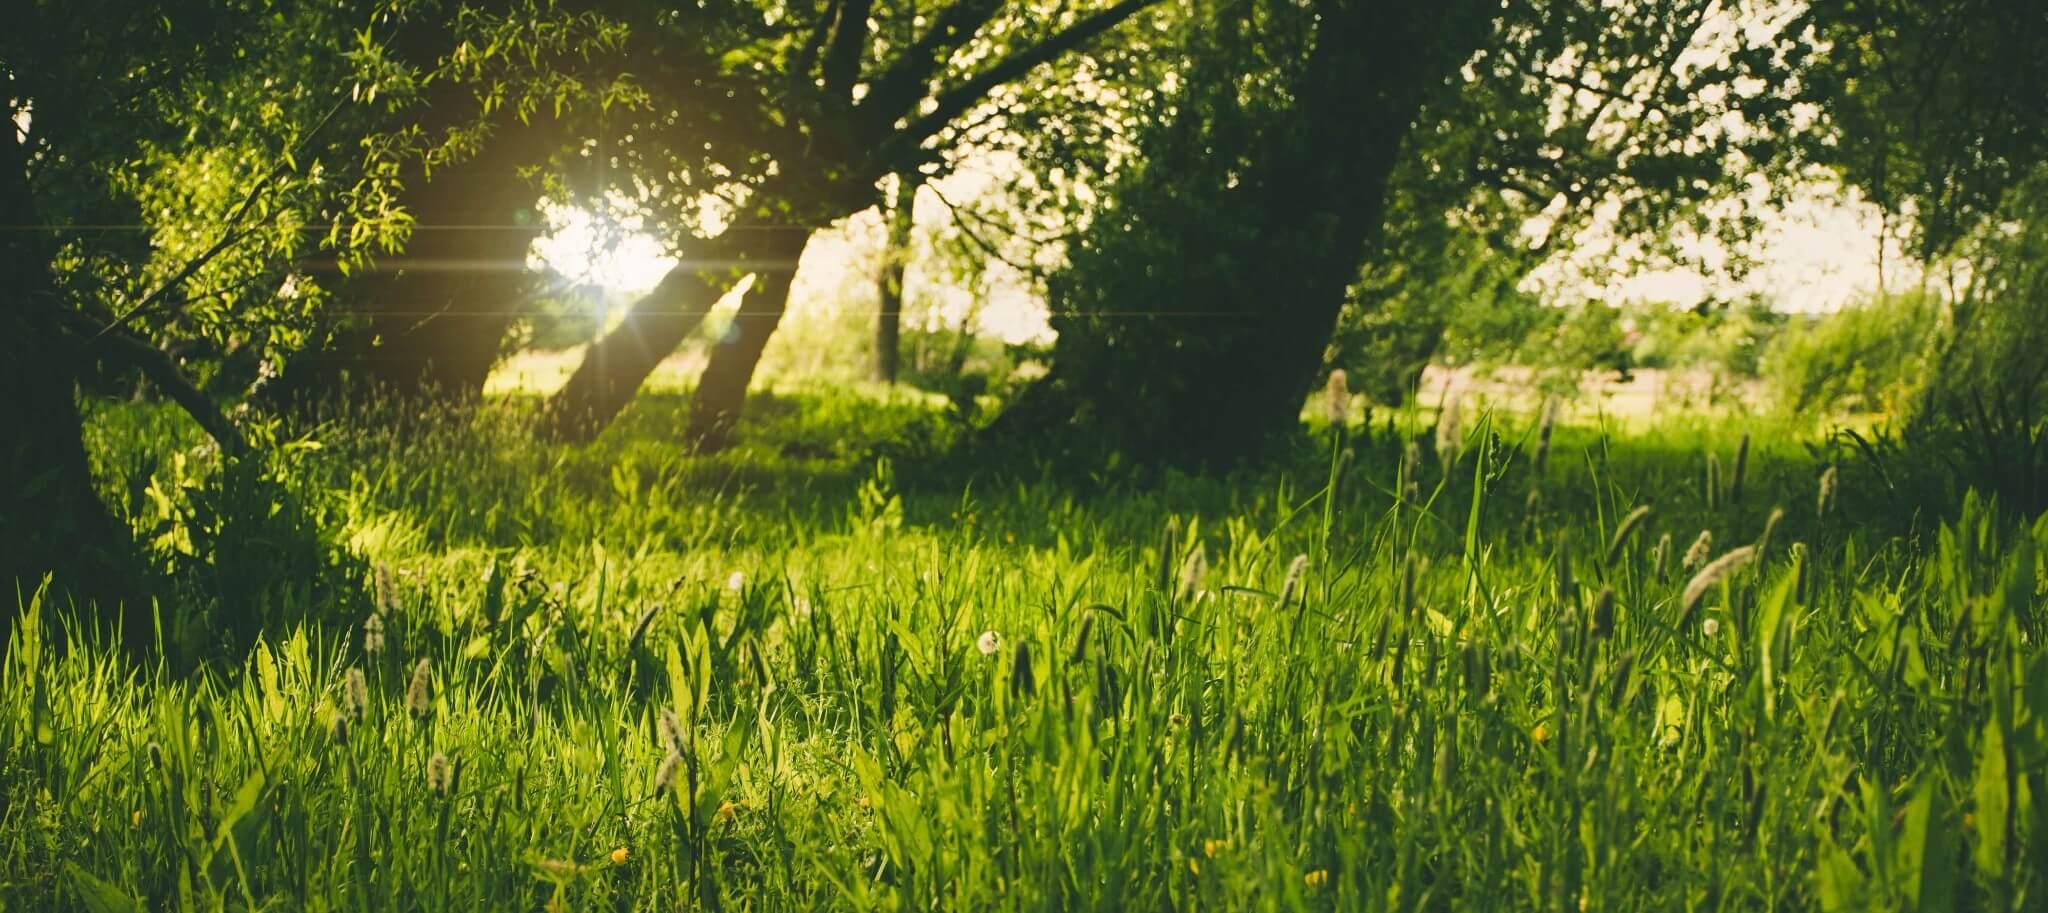 summer-grass-sunshine-hero.jpg